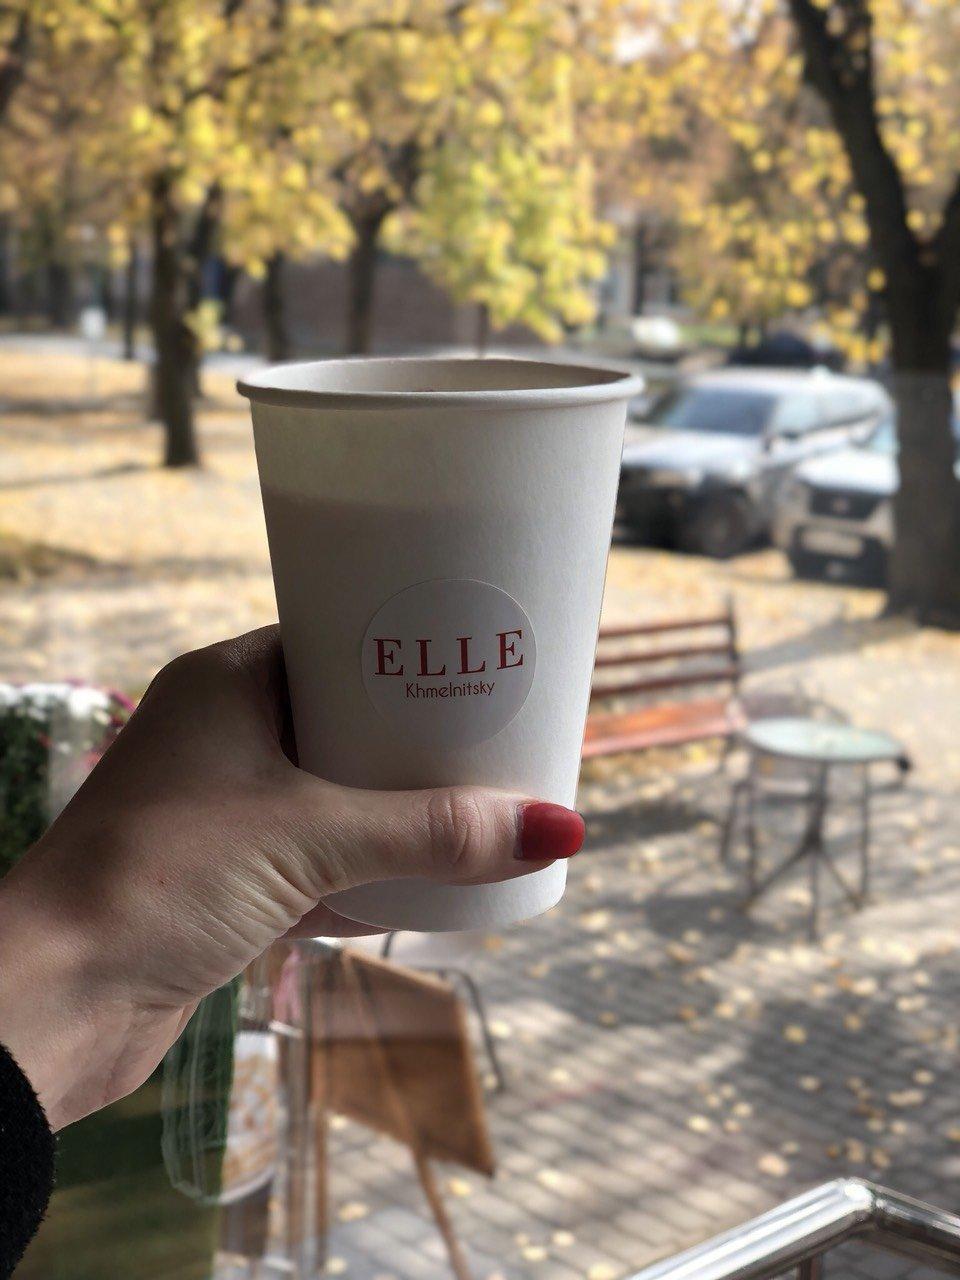 Кохання з присмаком кави: де у Хмельницькому провести День закоханих, фото-24